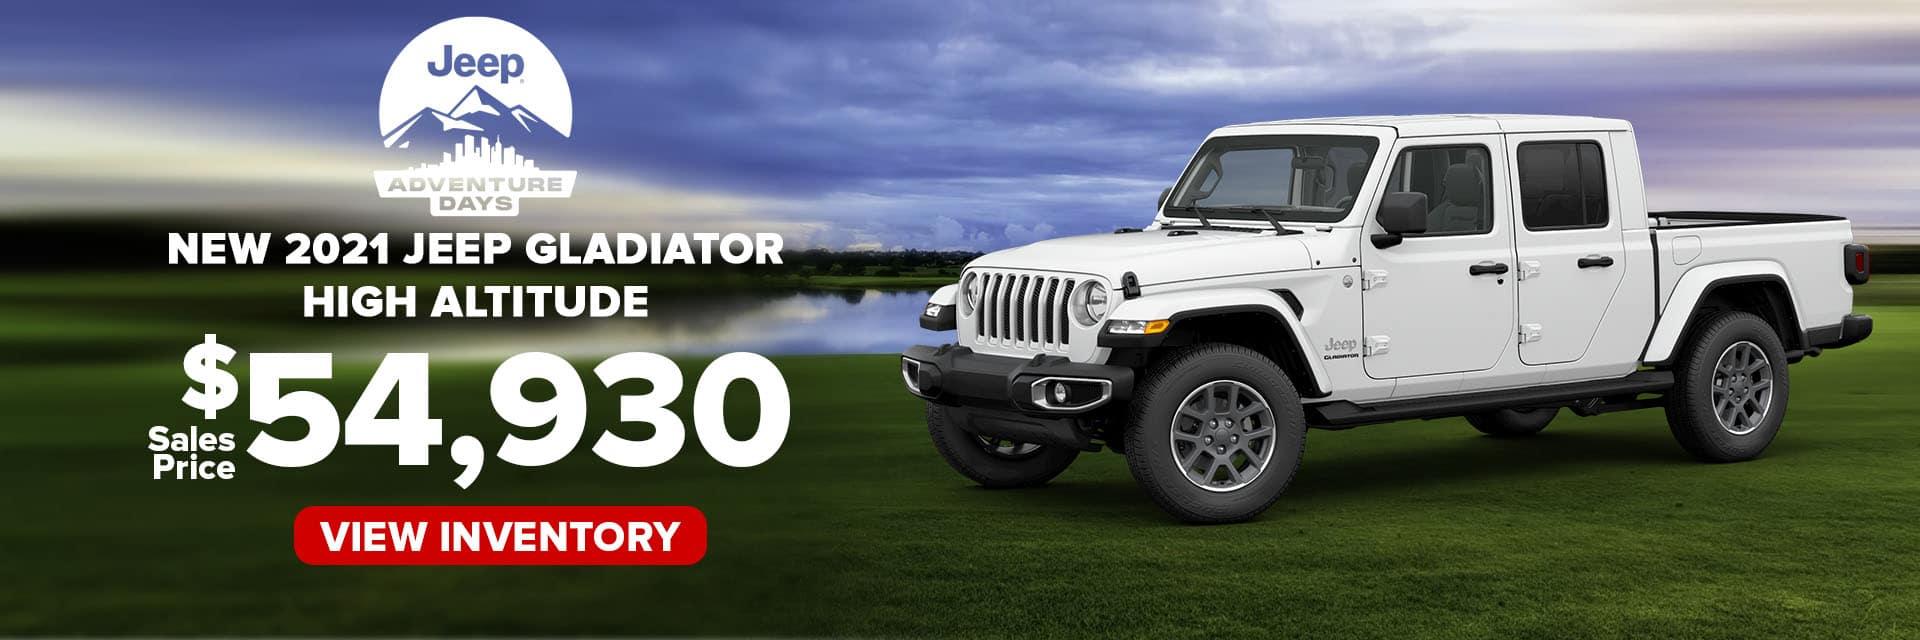 CLGO-October 2021-2021 Jeep Gladiator copy